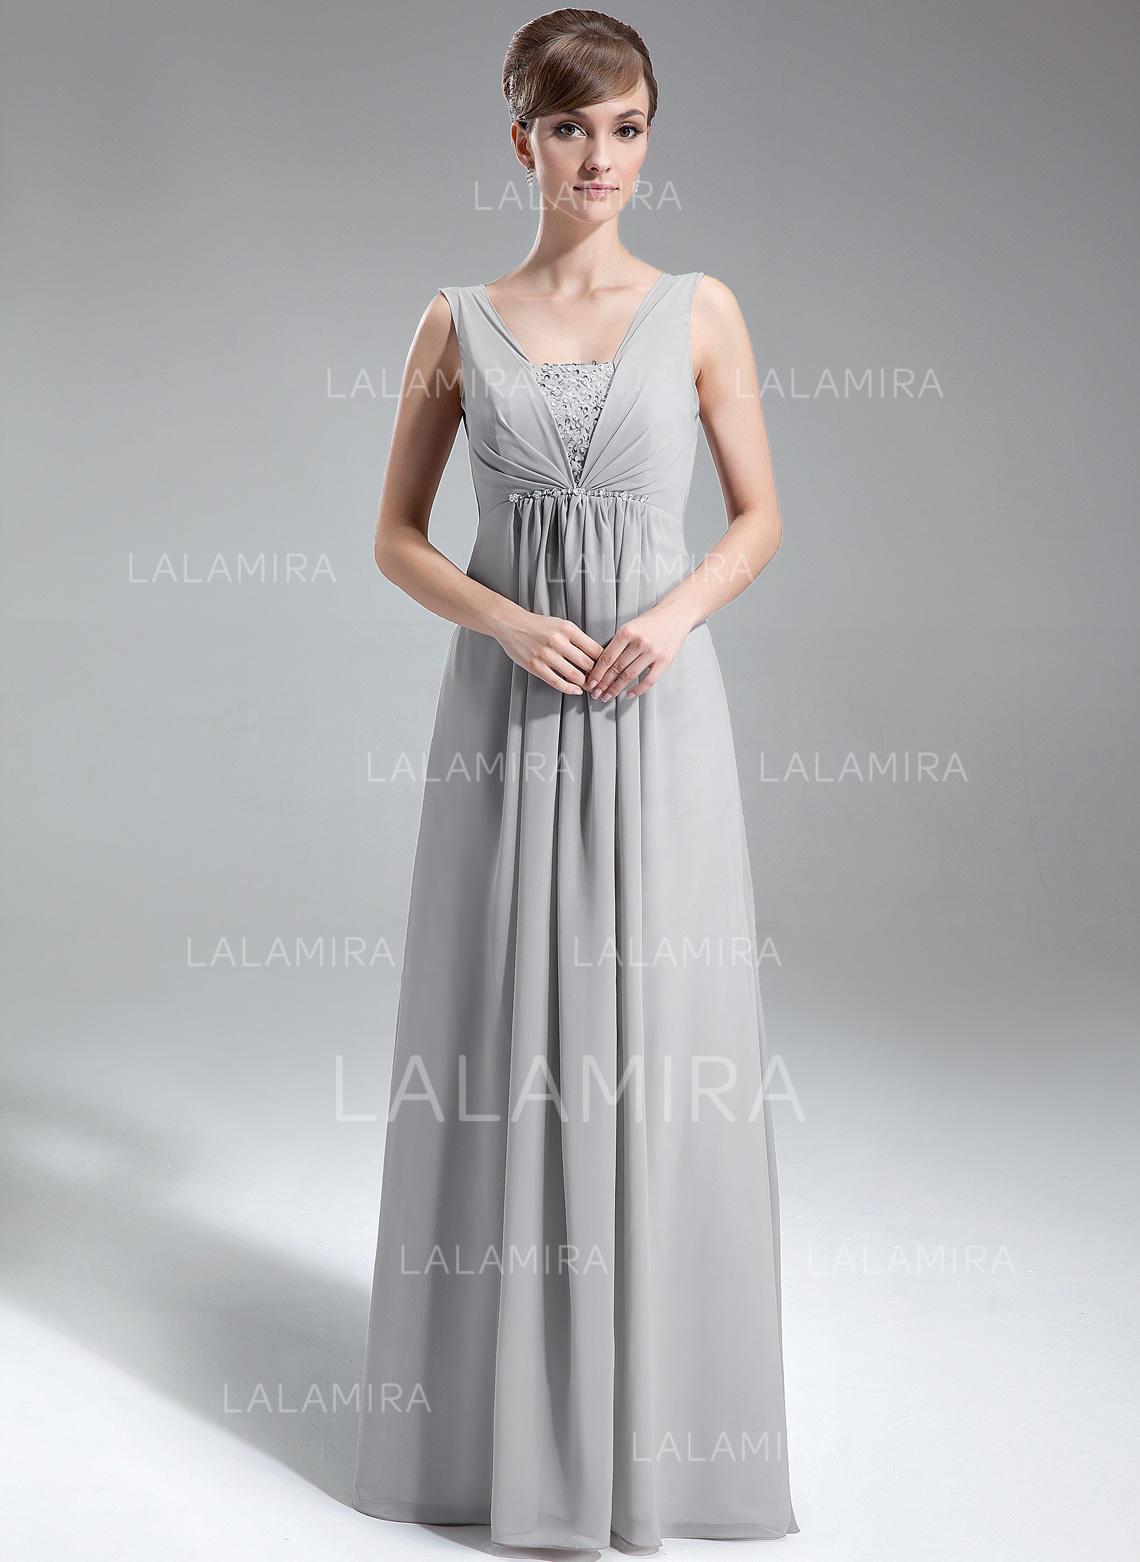 044a1f4cde1 A-Line Princess Chiffon Prom Dresses Ruffle Beading Sequins V-neck  Sleeveless Floor. Loading zoom